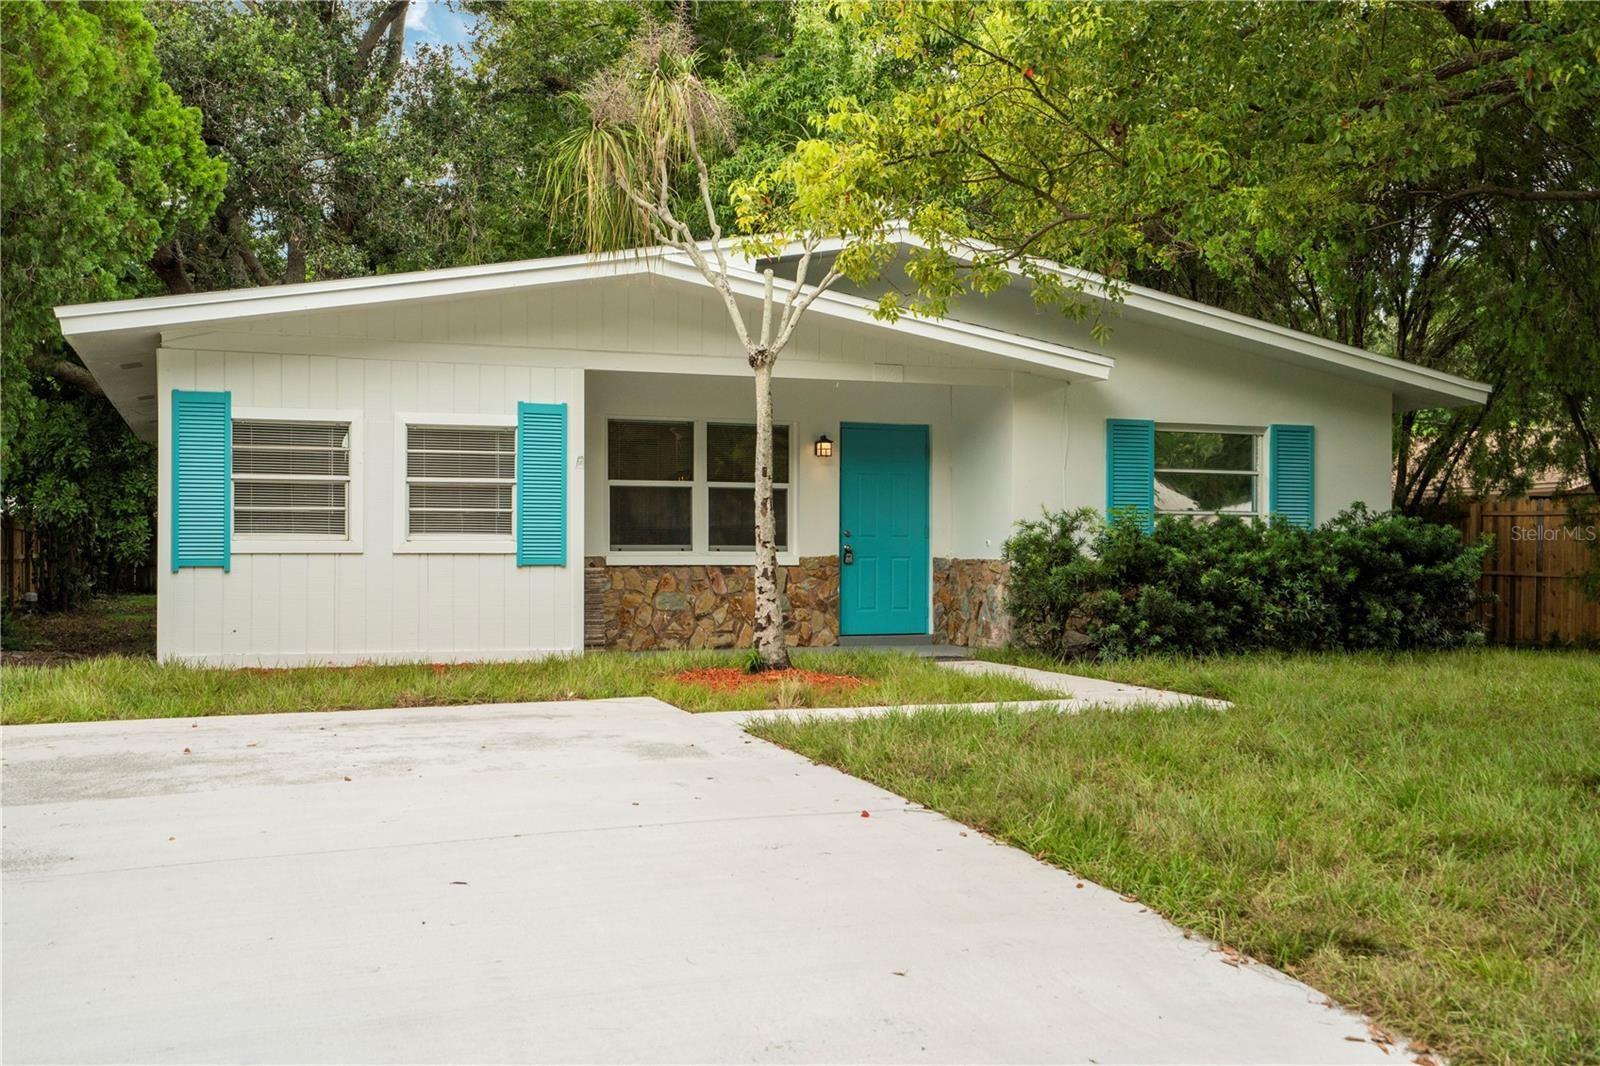 374 ROYAL PALM DRIVE, Largo, FL 33771 - MLS#: U8133325